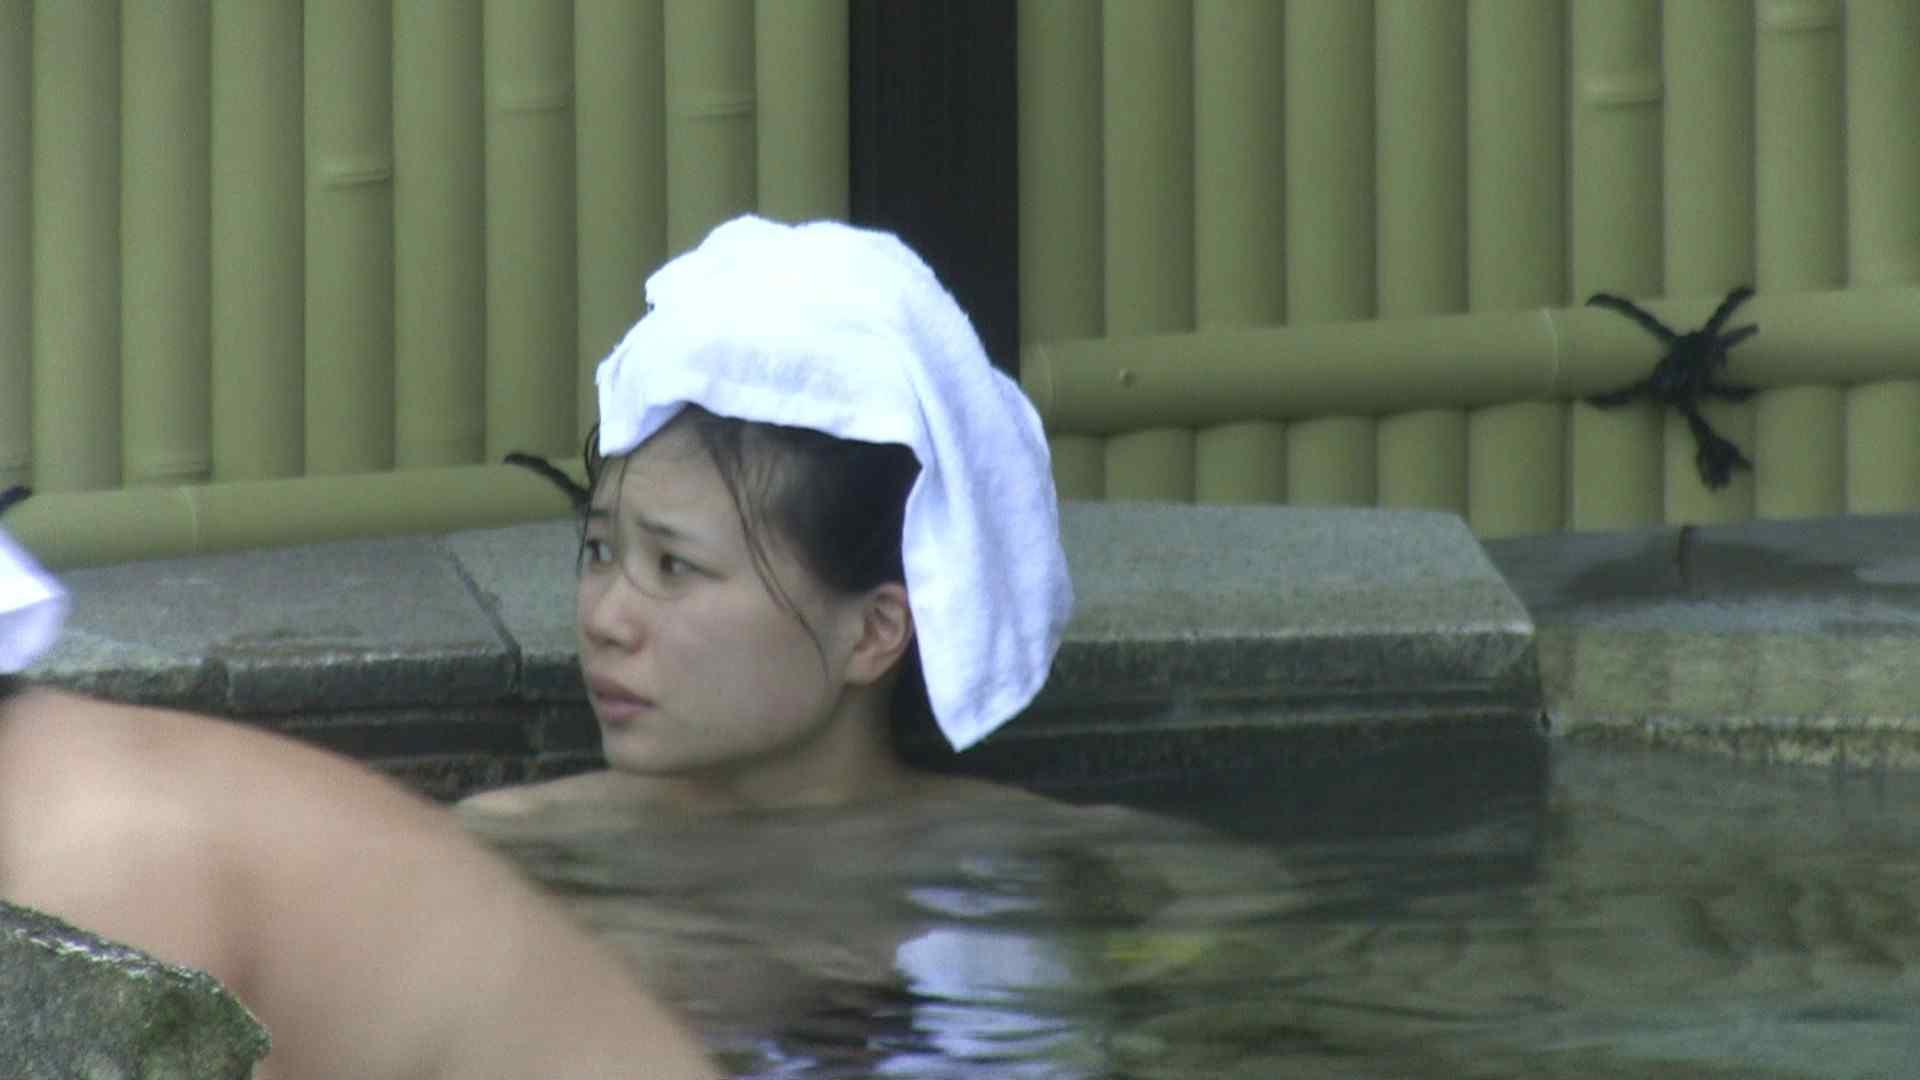 Aquaな露天風呂Vol.183 露天風呂編 | 盗撮シリーズ  104PIX 65